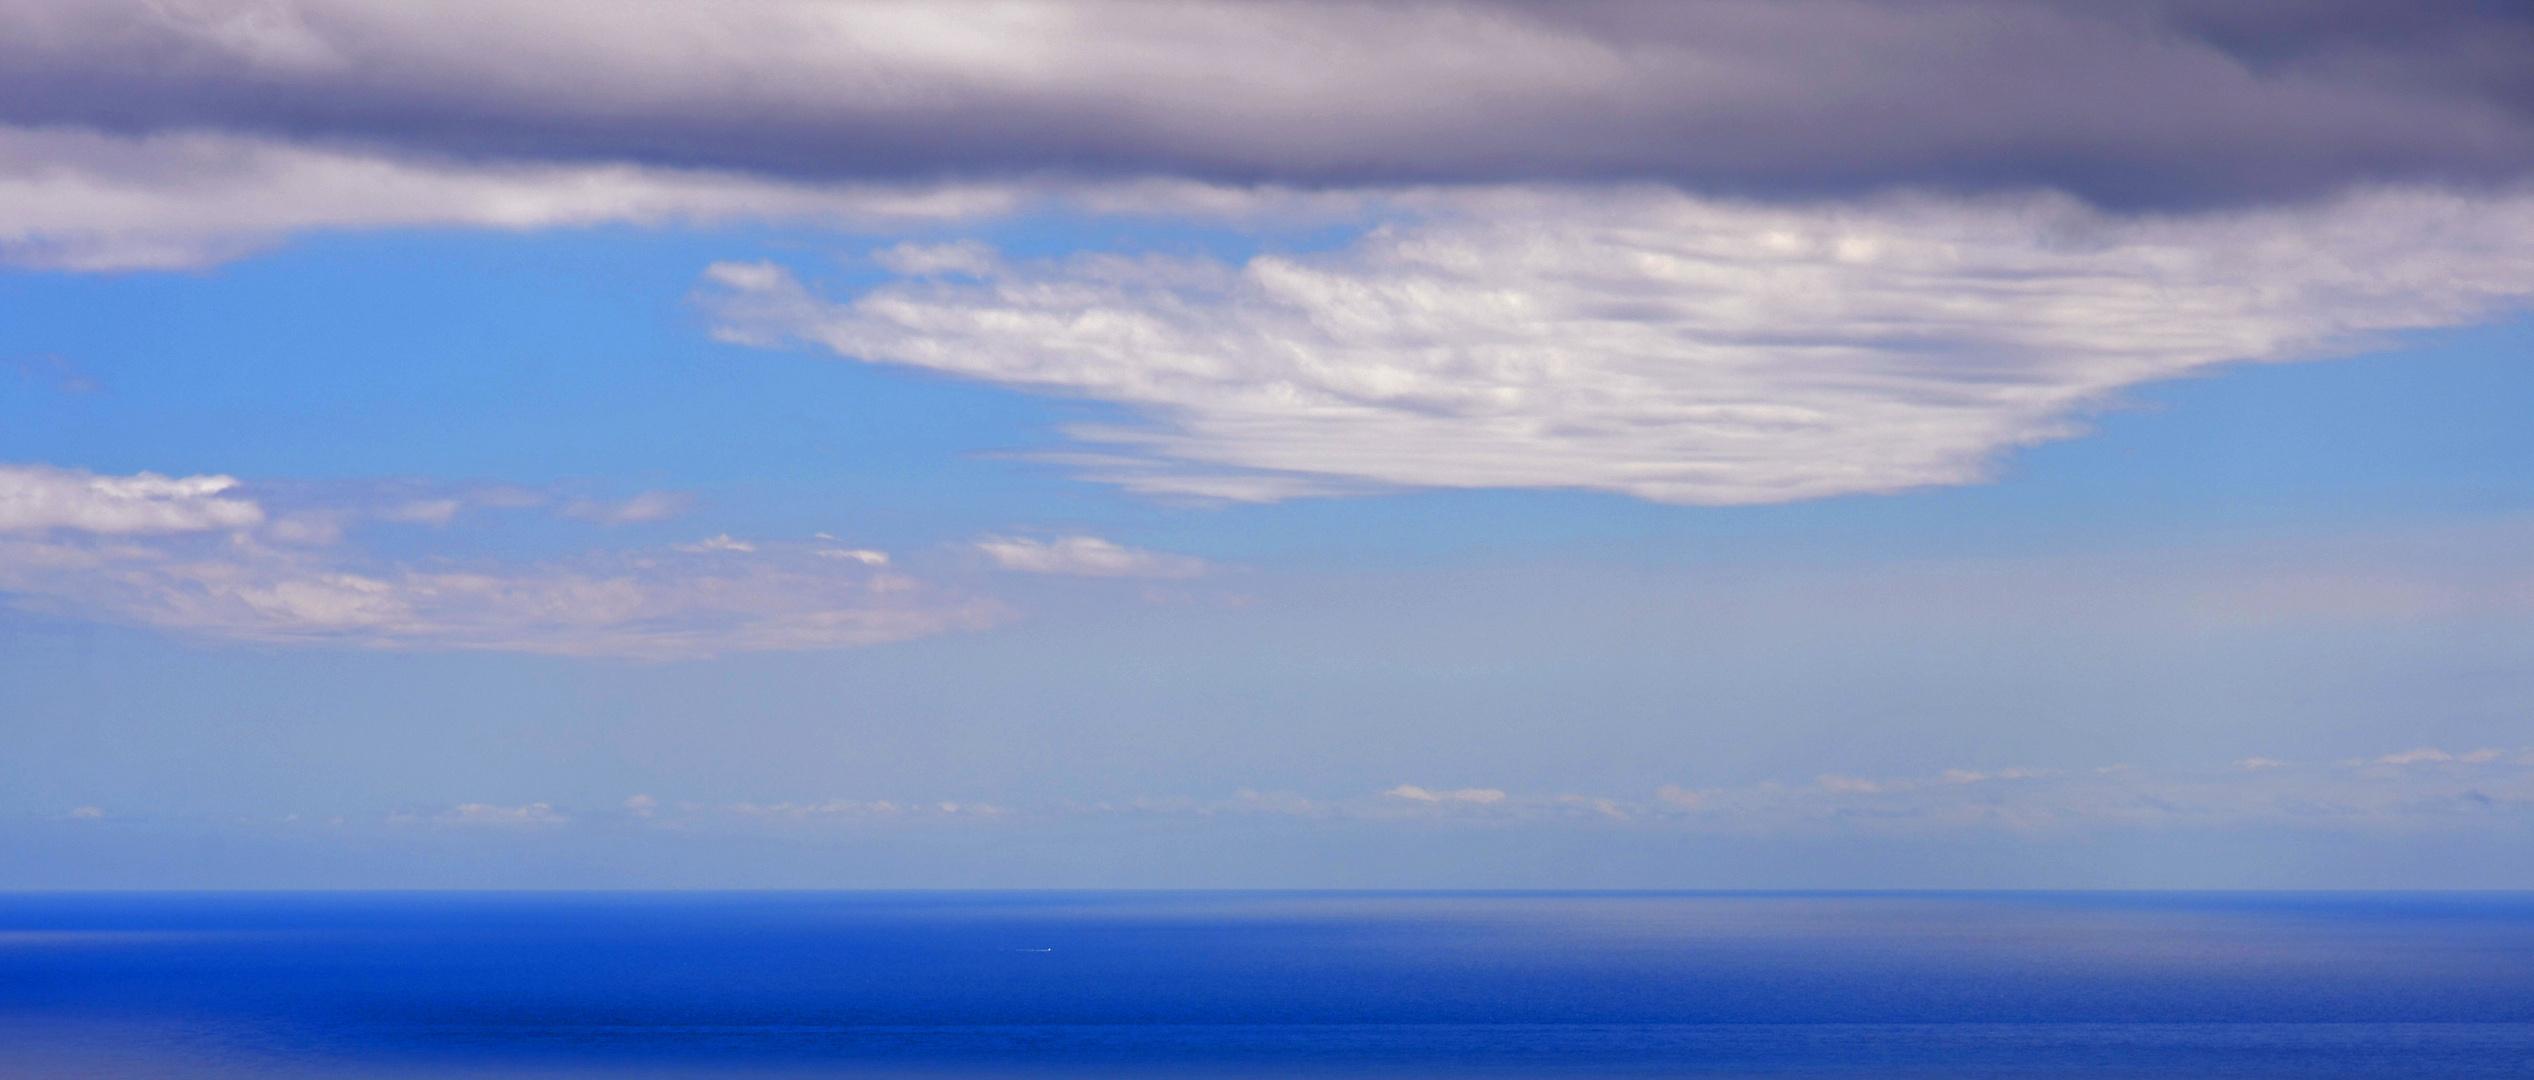 horizonte uno